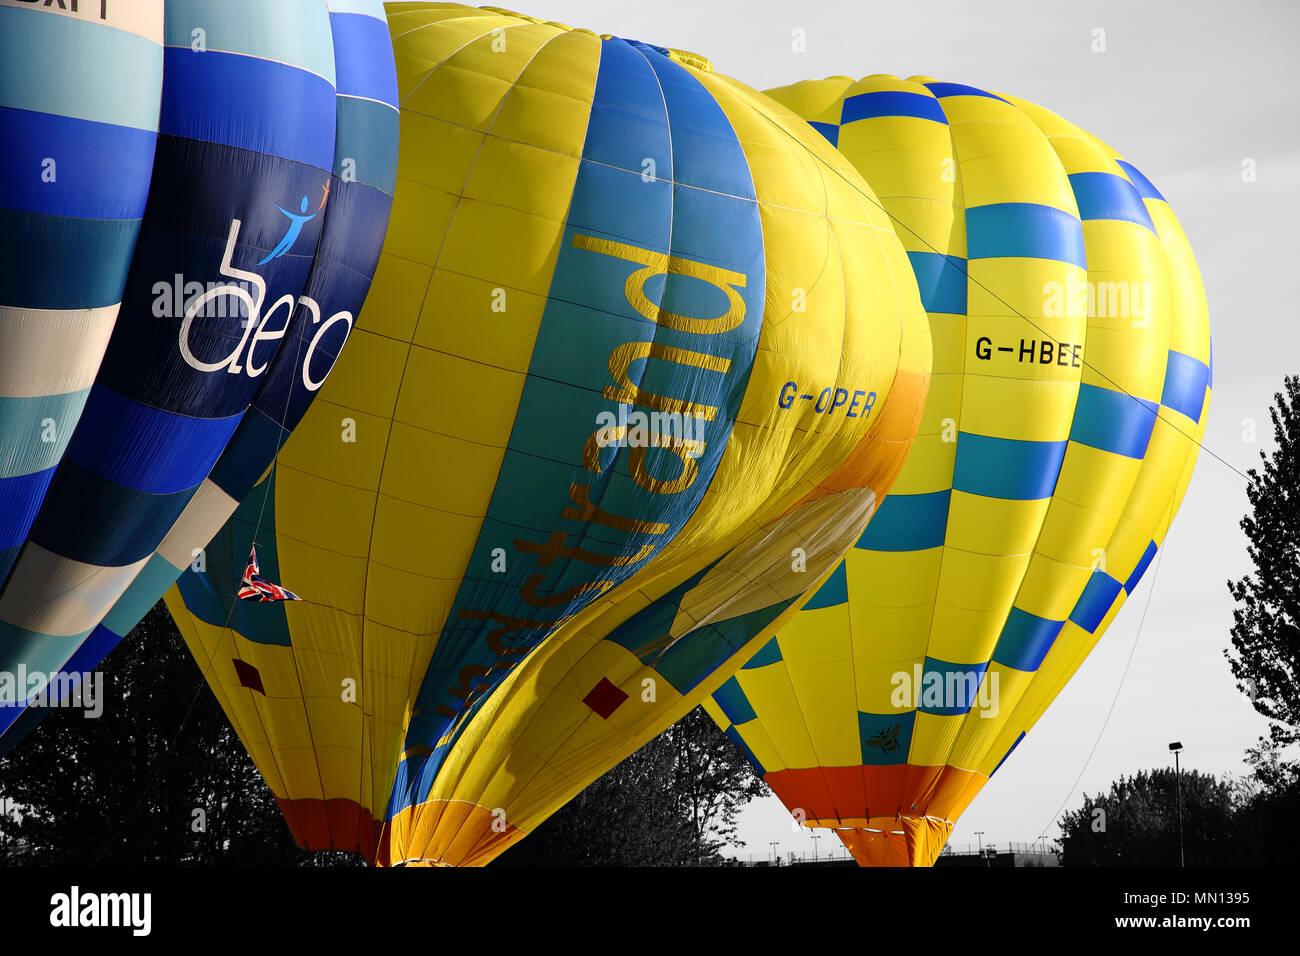 Lindstrand balloon preparing to take off. Telford Balloon and Kite Festival, Telford Town Centre, Telford, Shropshire.  United Kingdom.  12th May 2018 Stock Photo